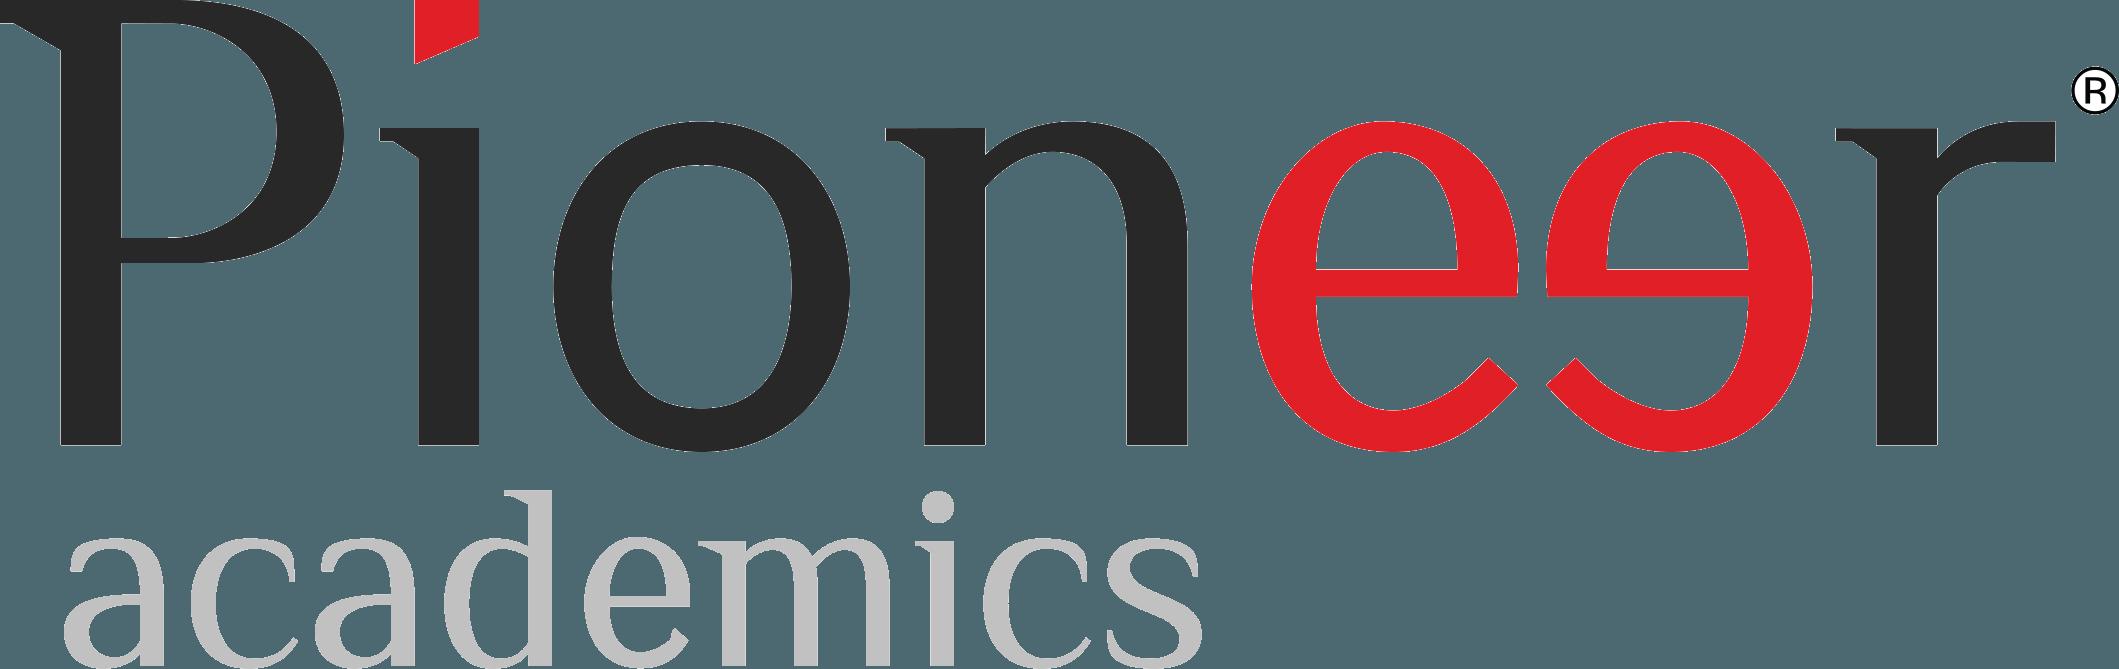 Pioneer Academics